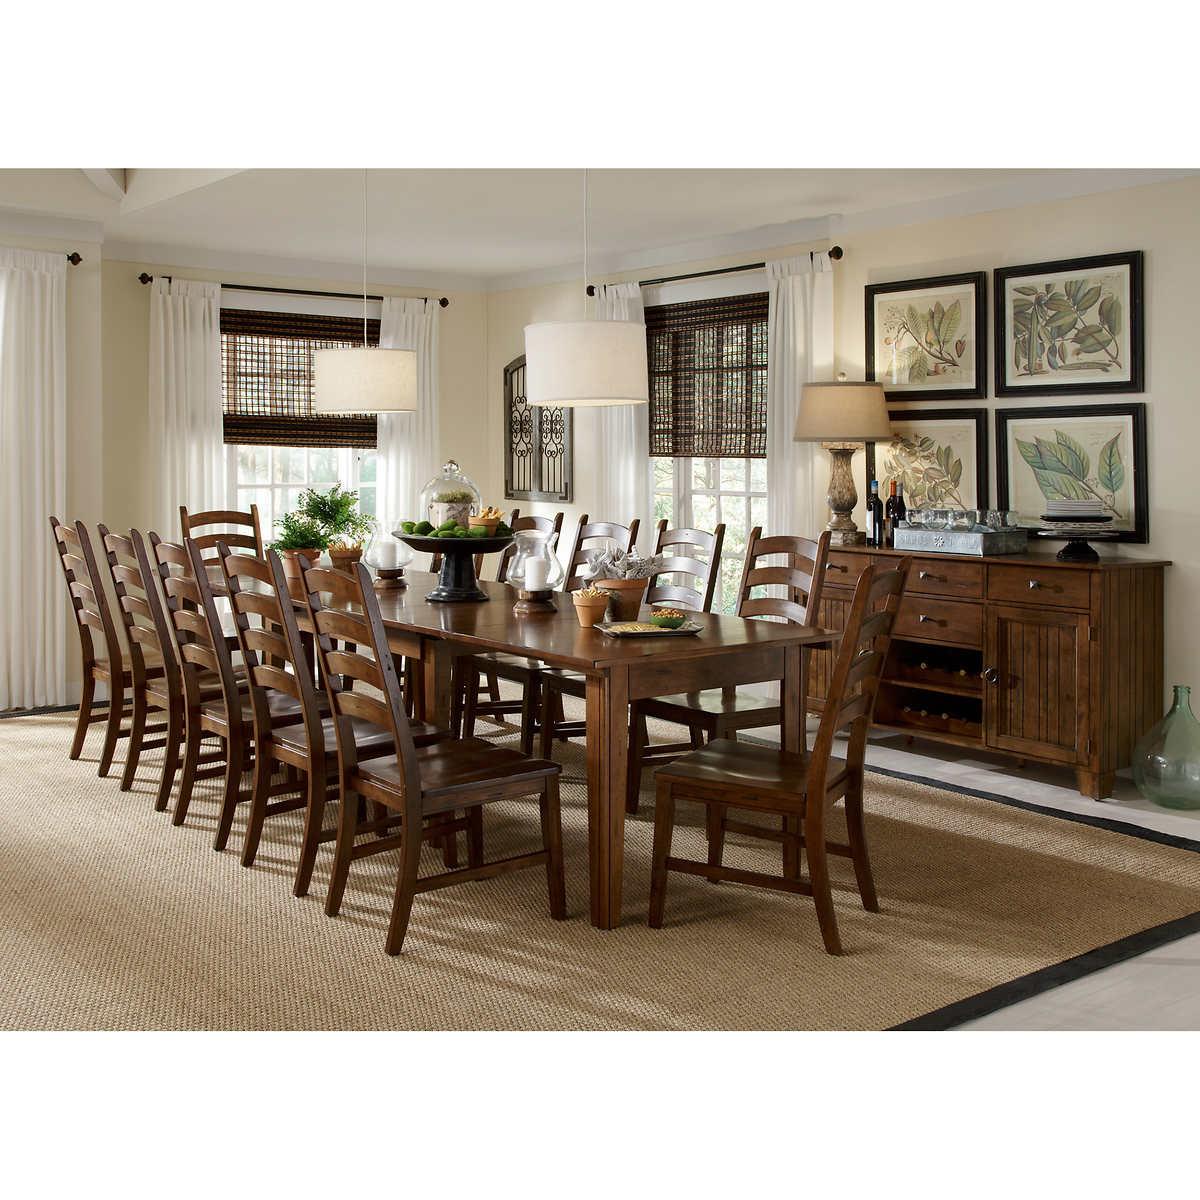 Dining & Kitchen Furniture | Costco